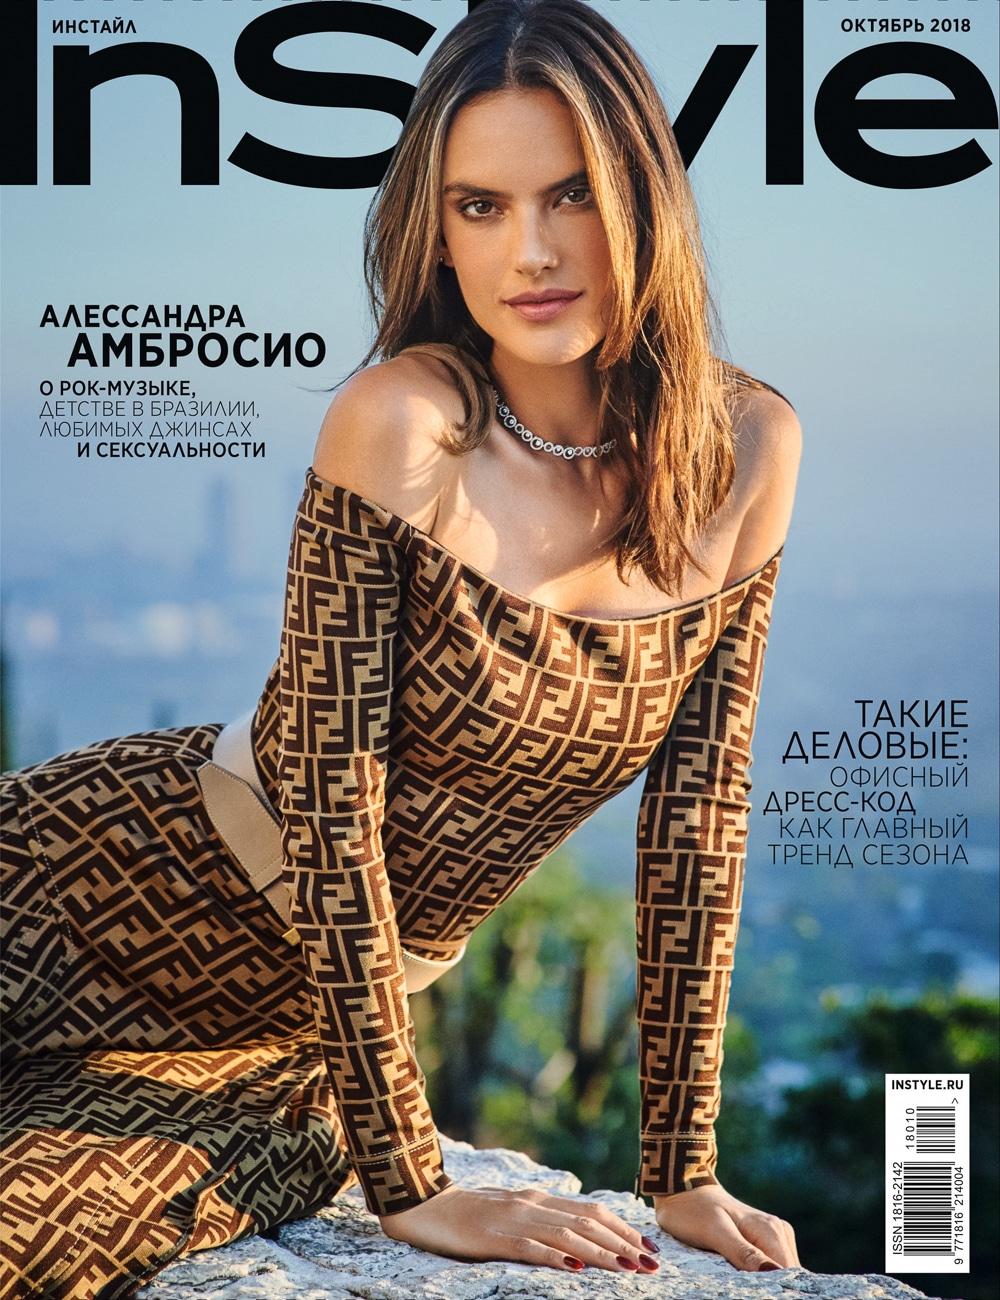 Alessandra-Ambrosio-InStyle-Russia-October-2018-Stewart-Shining-5.jpg